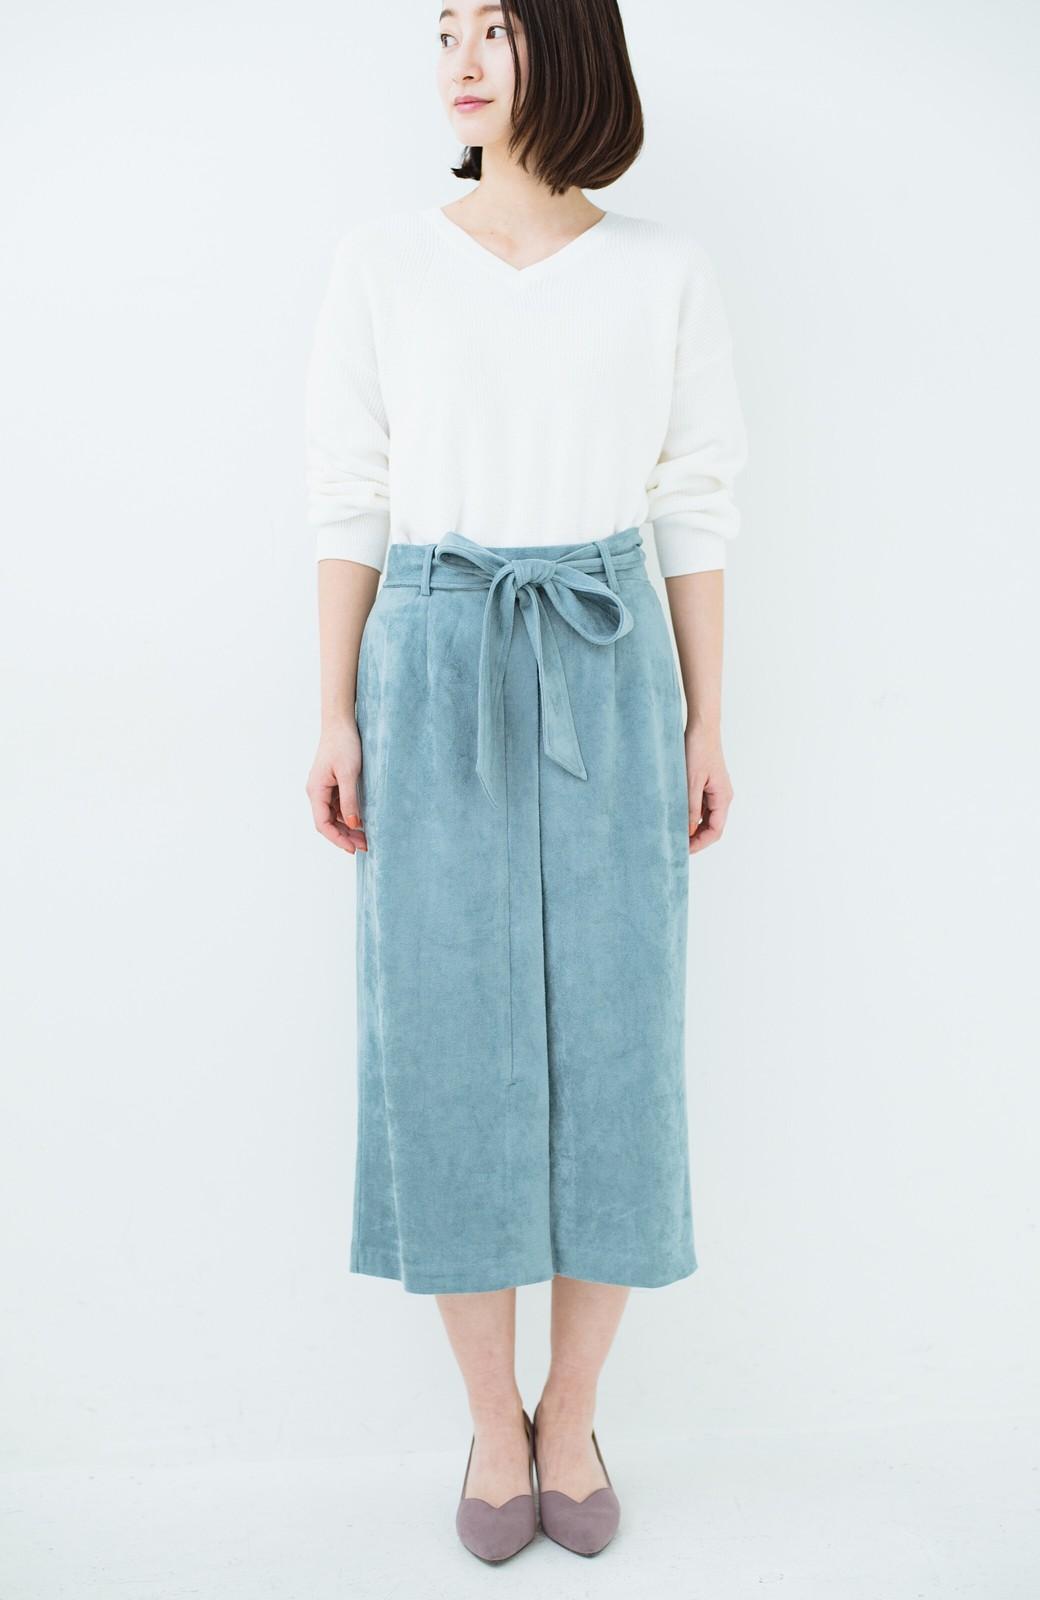 haco! 大人が安心して着られるタイトスカート by que made me <グレイッシュブルー>の商品写真18